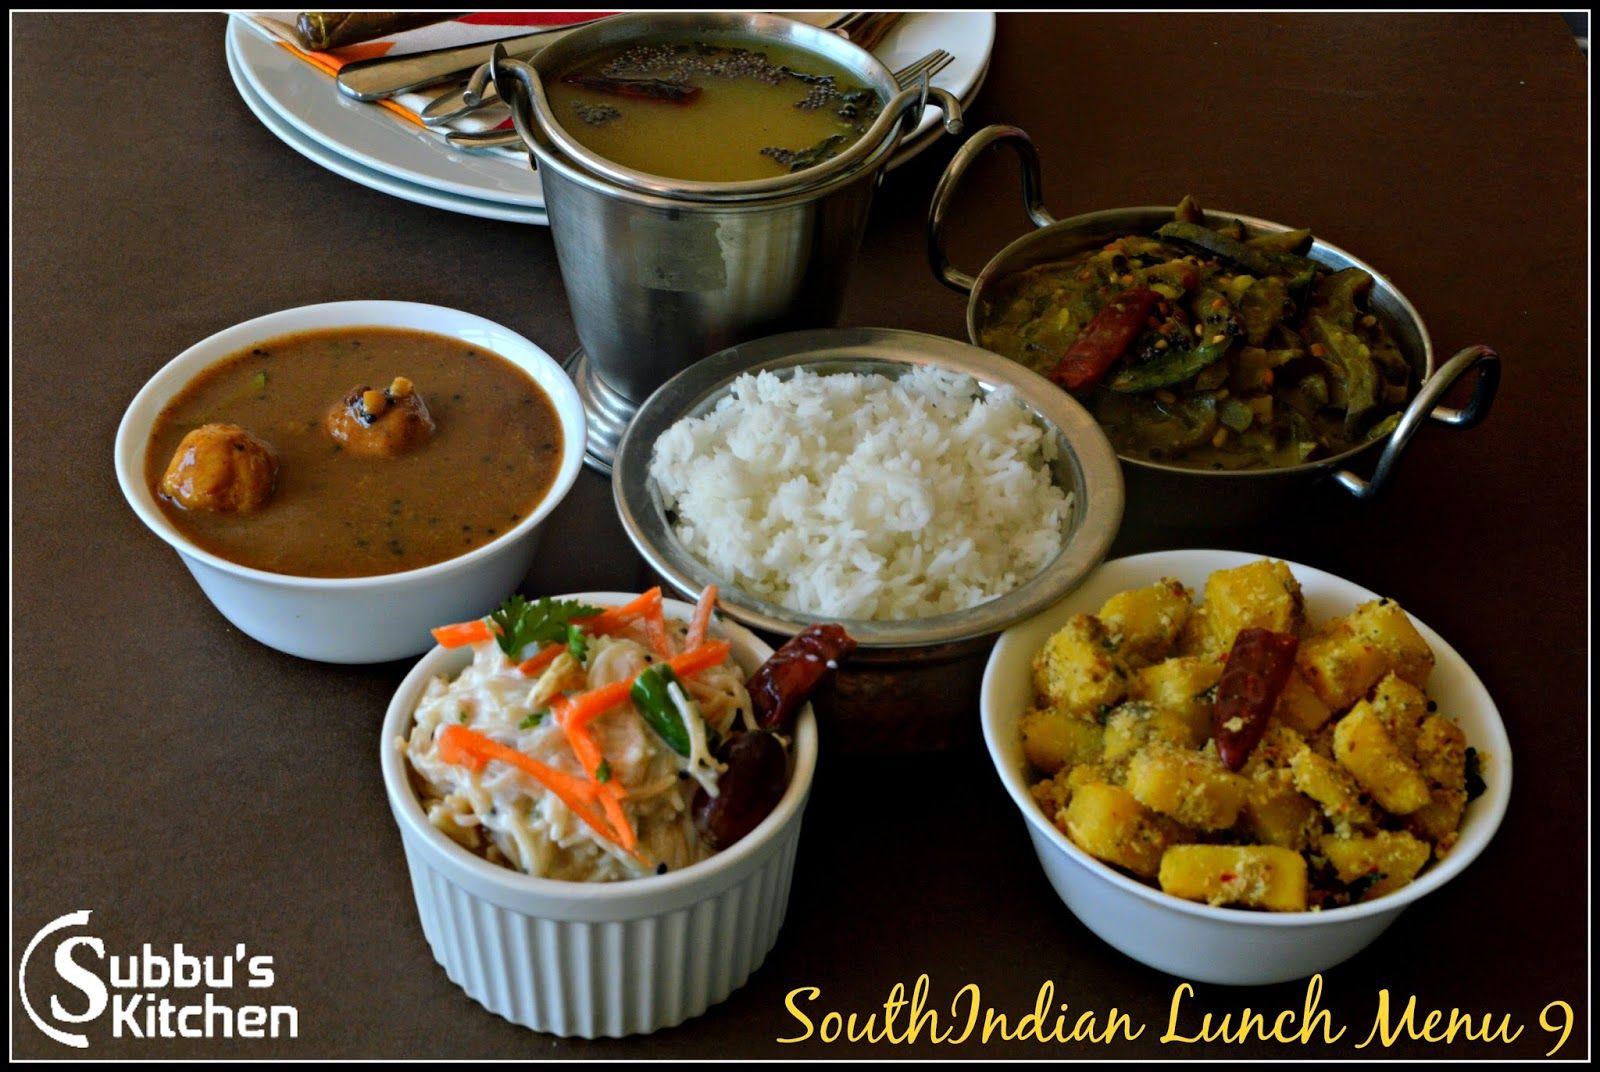 South Indian Lunch Menu 9 Paruppu Urundai Kuzhambu Mor Rasam Raw Banana Poriyal Brinjal Stew And Curd Semiya Lunch Menu Lunch Raw Banana